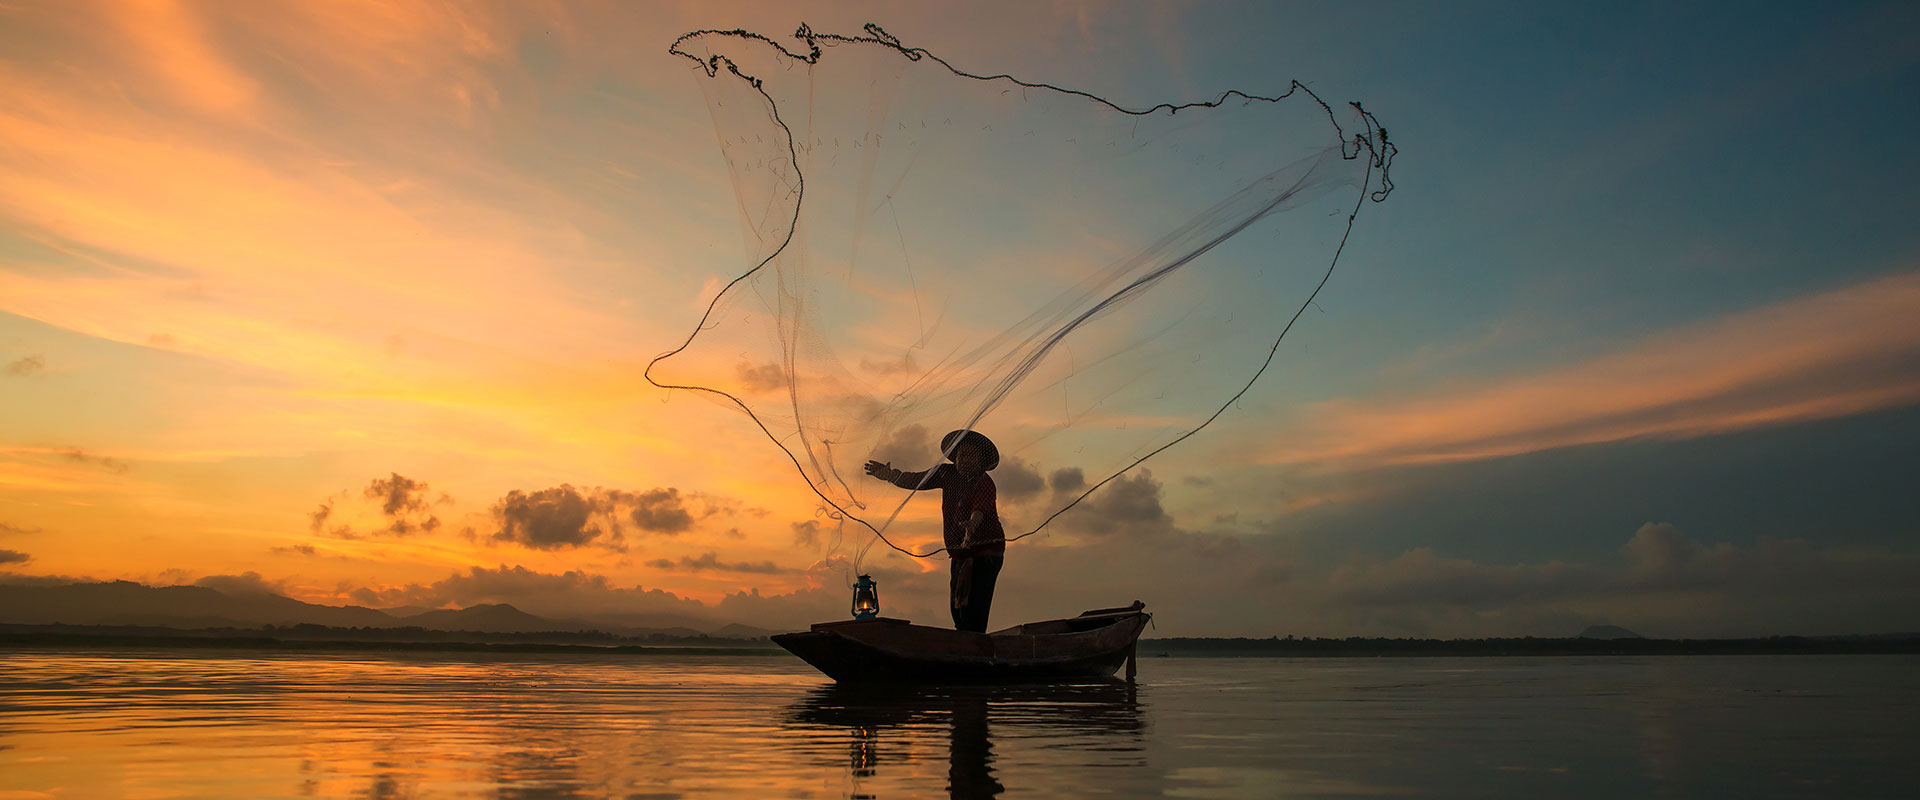 pesca-redes